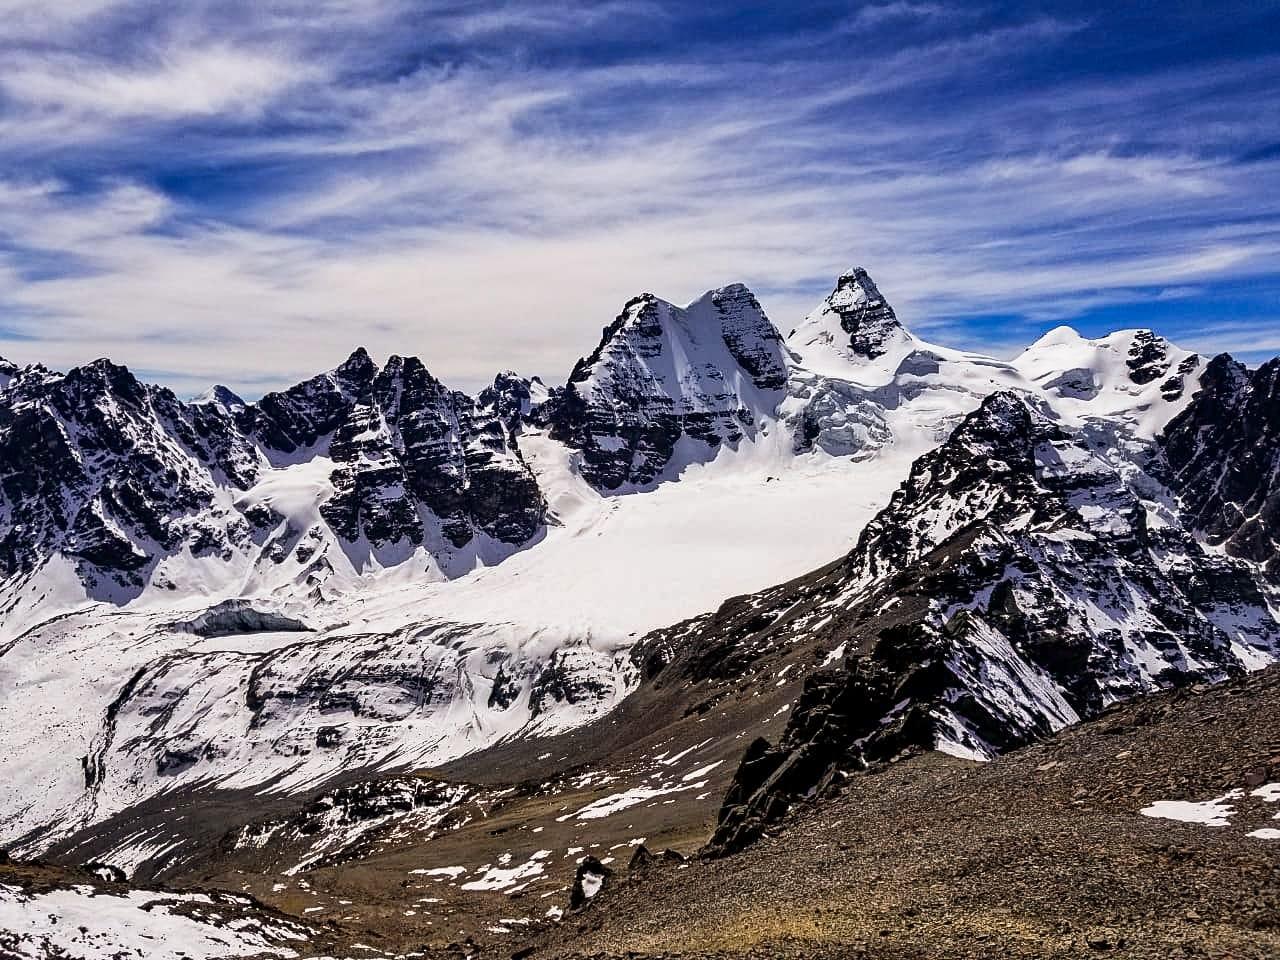 Bolivia Expedition   The Adventure of a Lifetime